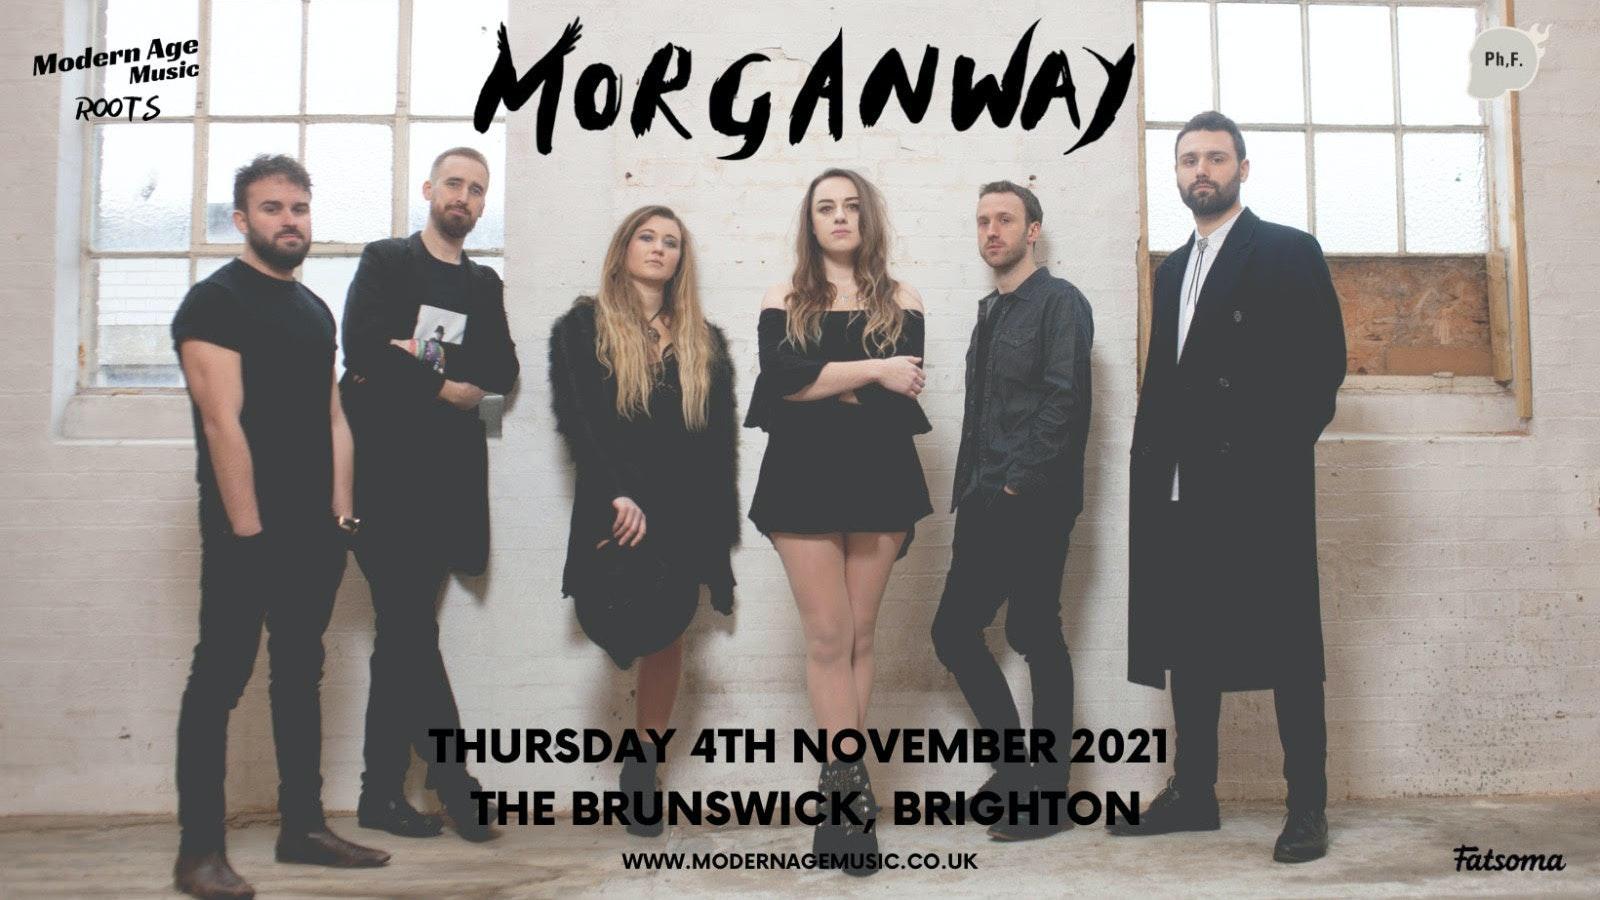 Morganway live at The Brunswick, Brighton  + The Heavy Heavy + Jake Morrell